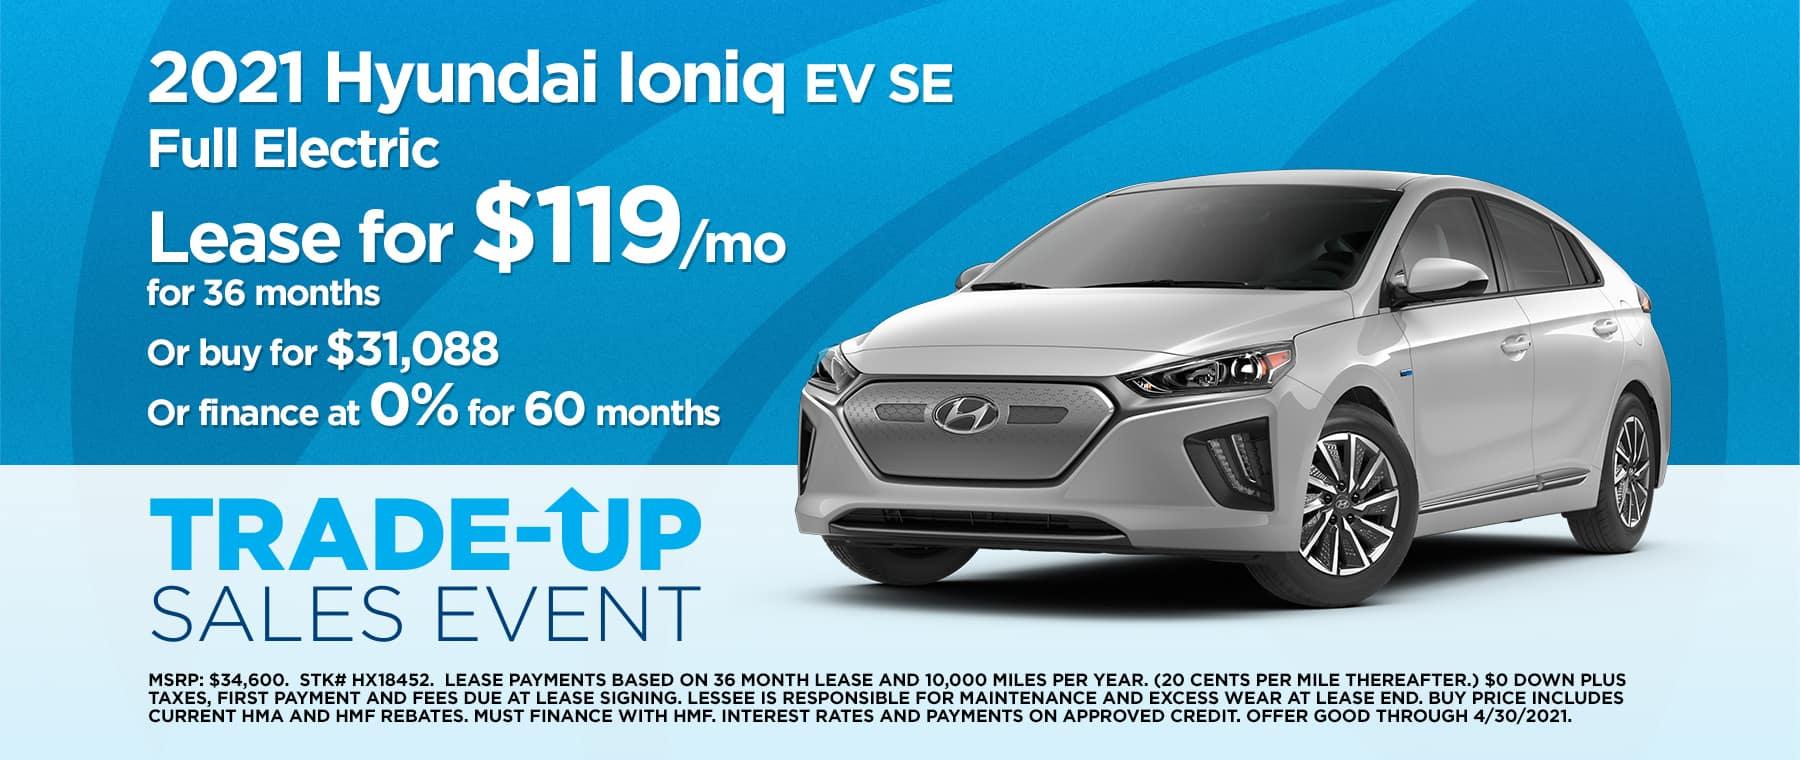 2104 Hyundai Ioniq EV